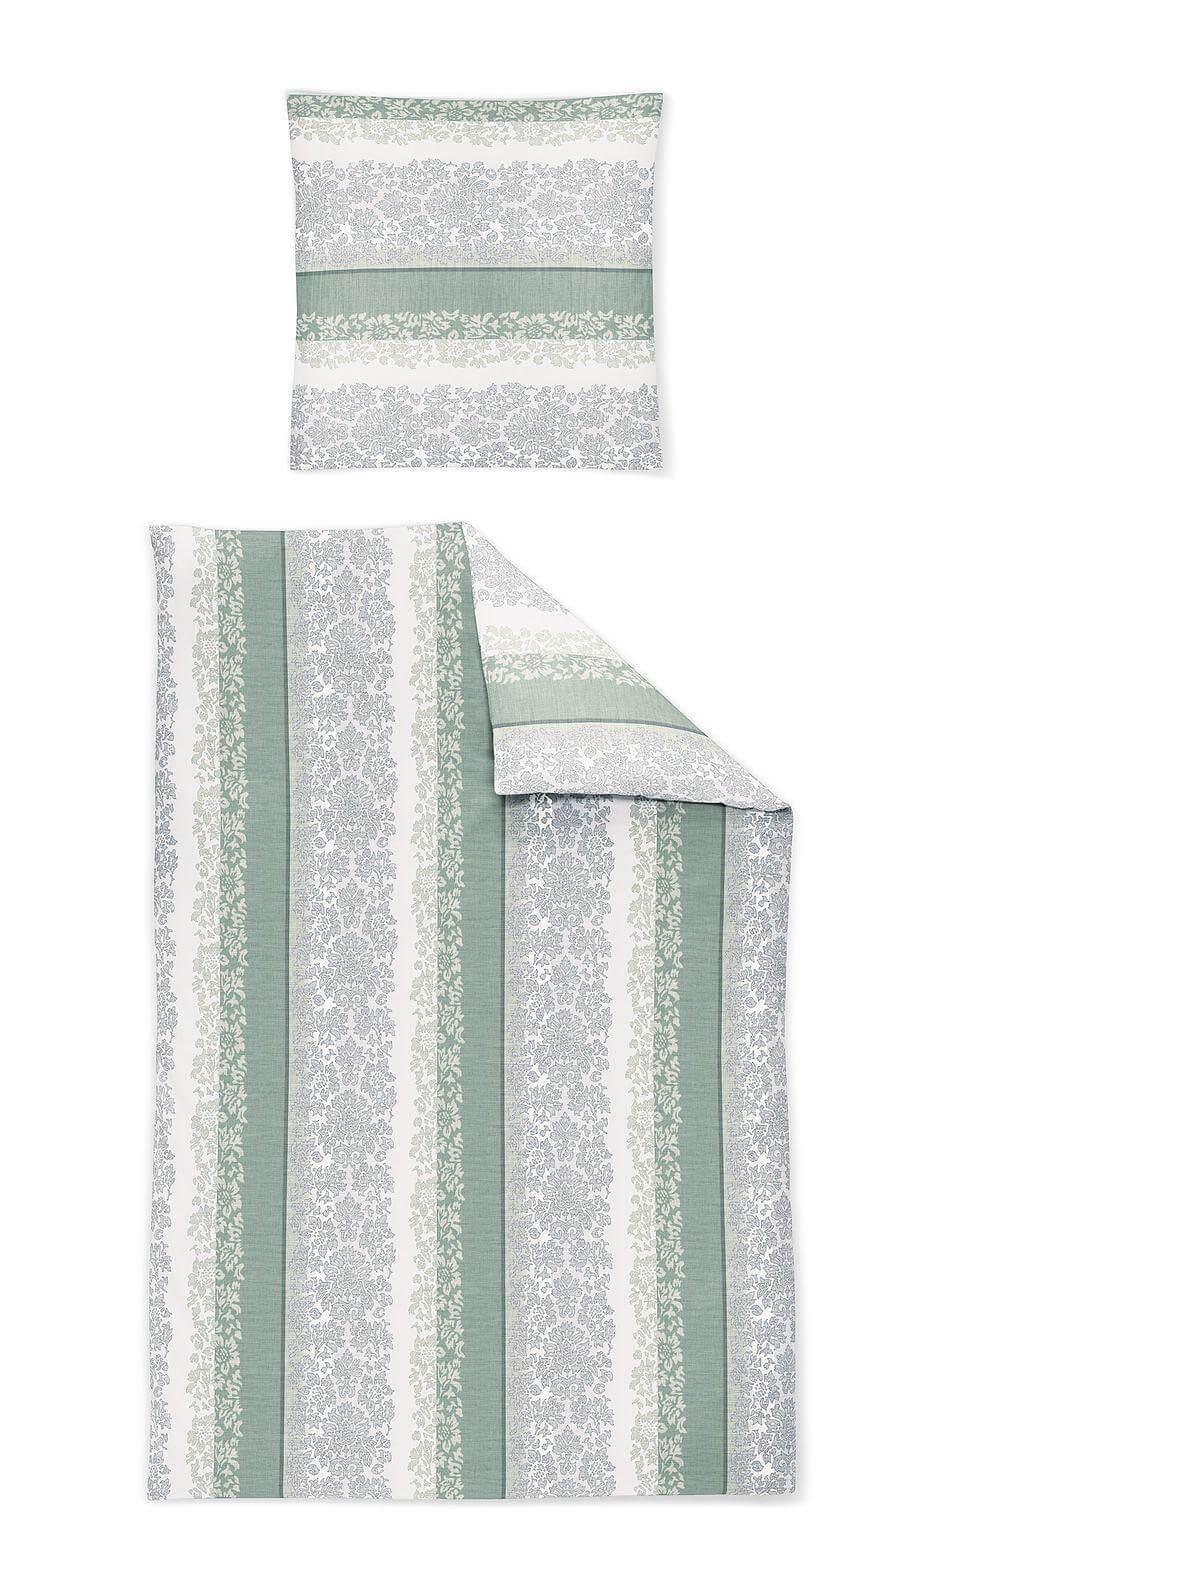 Постельное белье Irisette Piano 155х220 см, арт. 8704-30 - Петербург